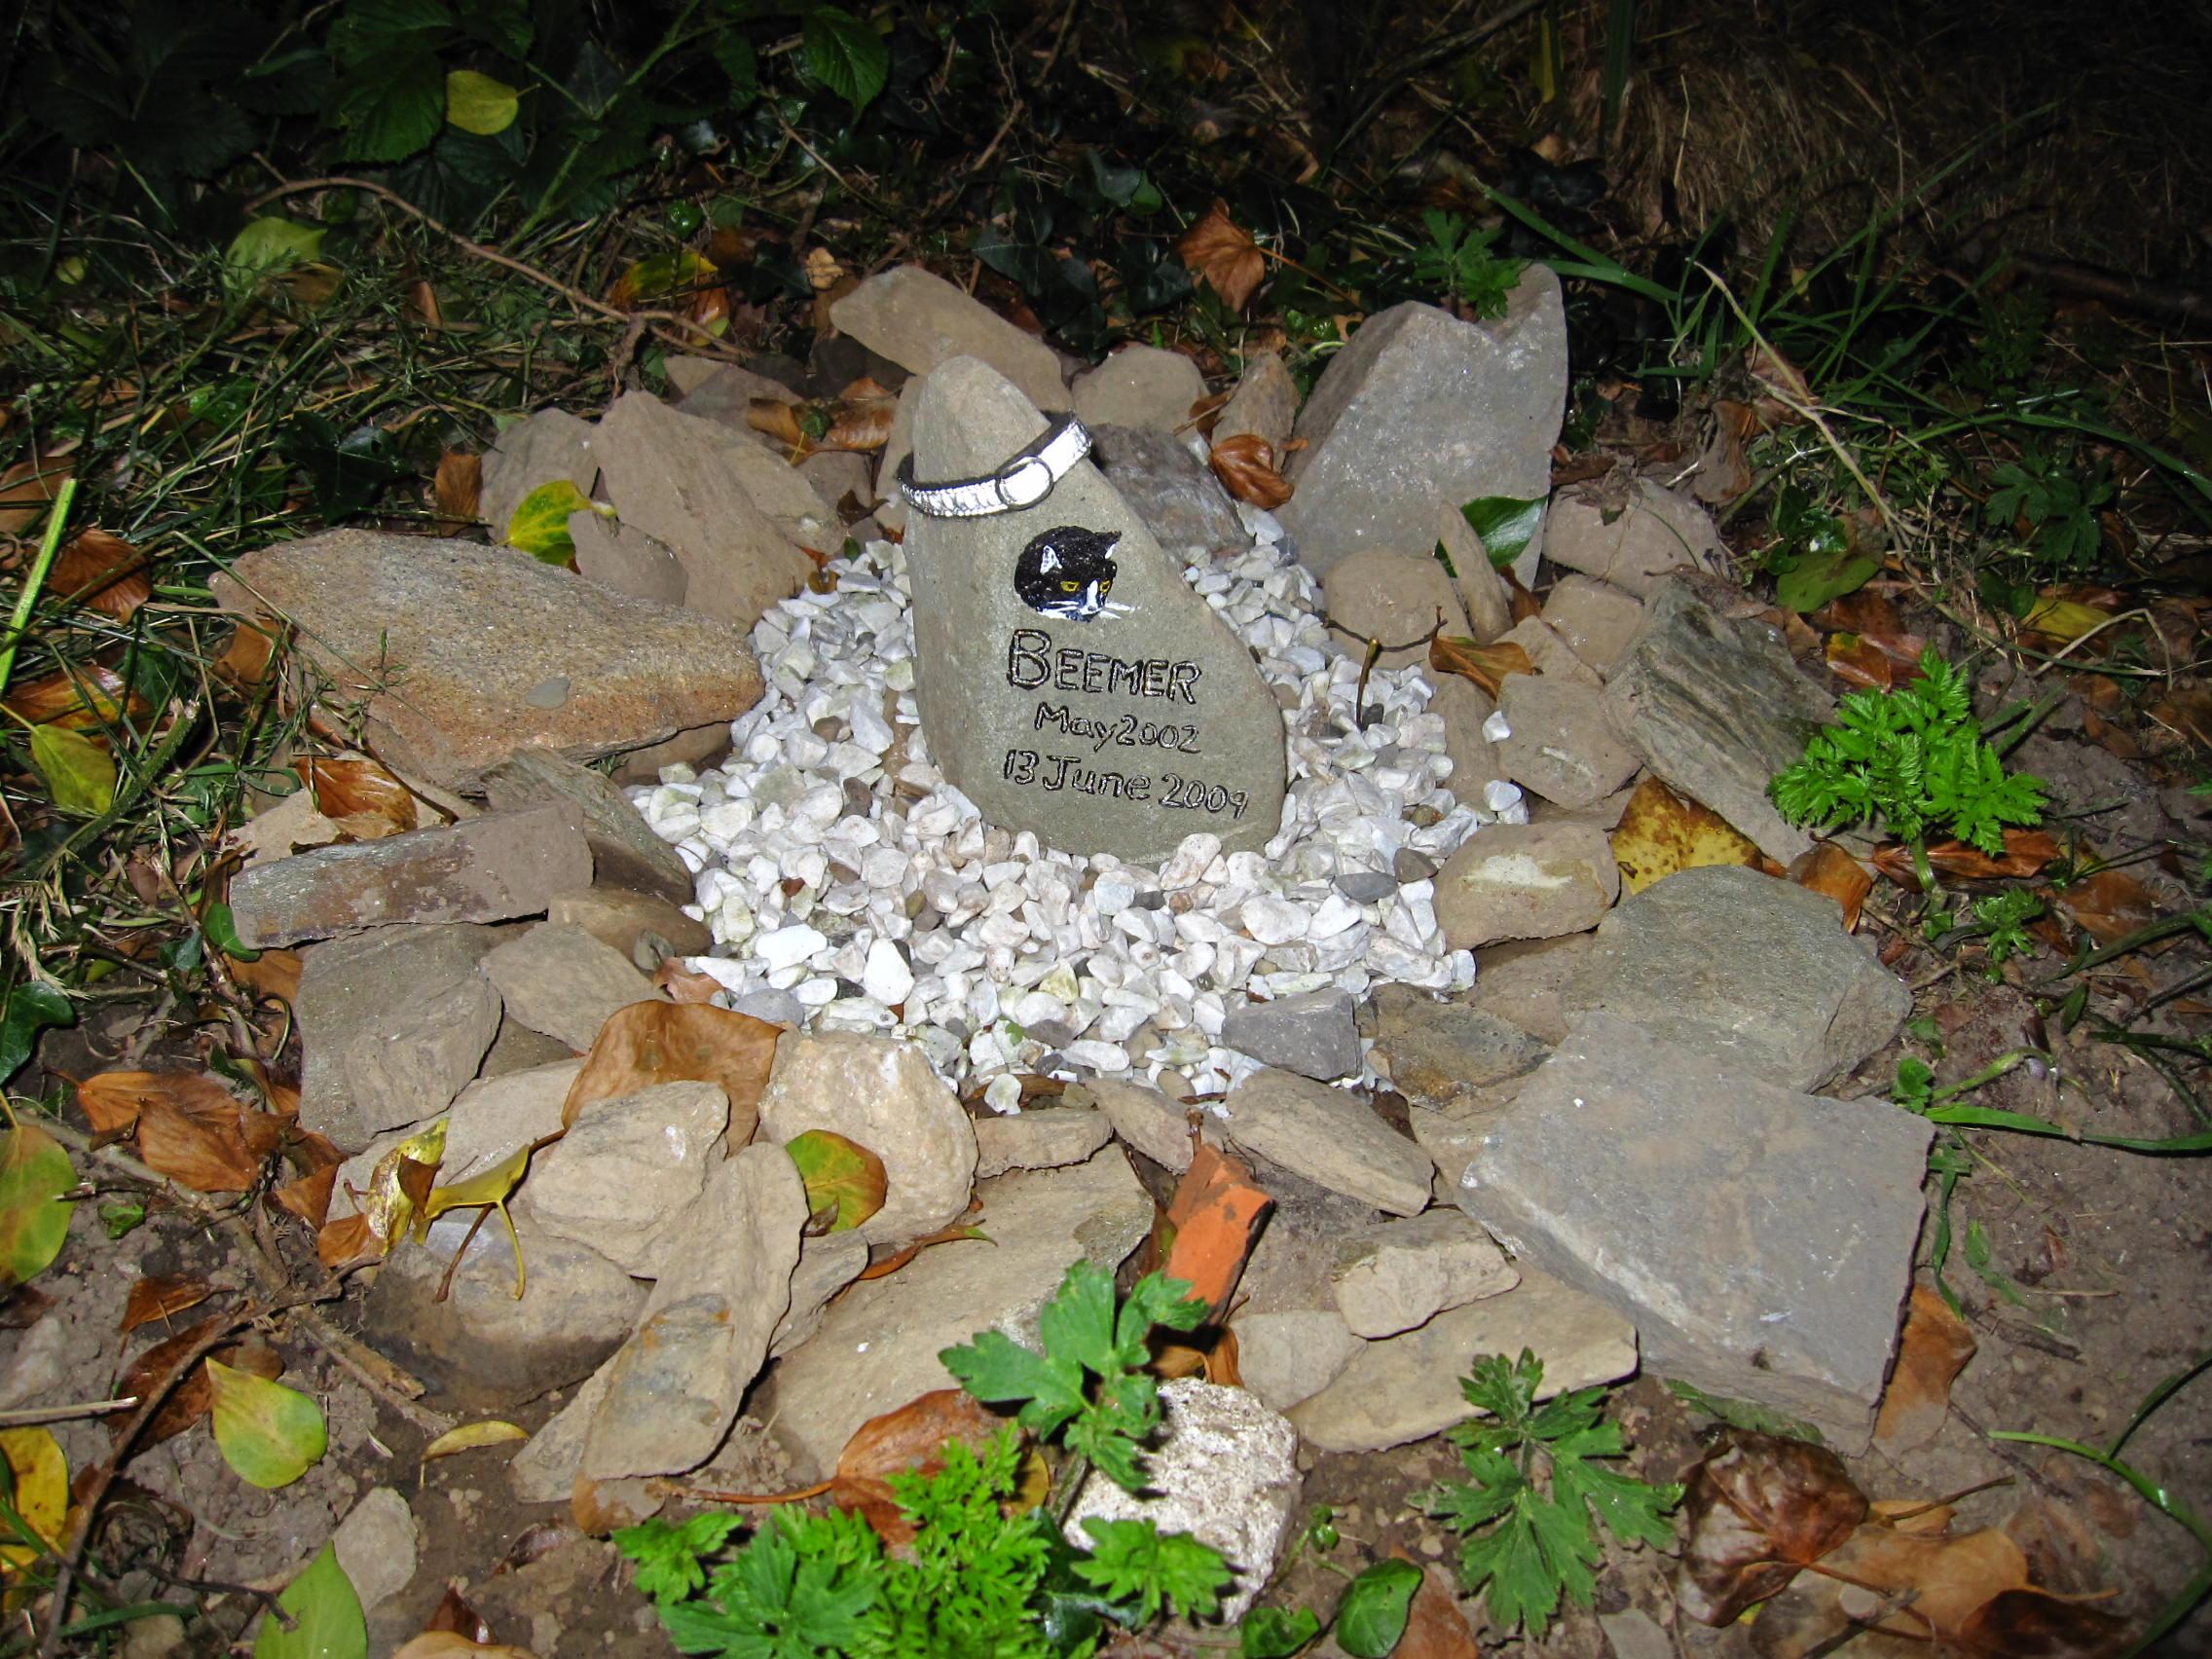 Beemer's Grave